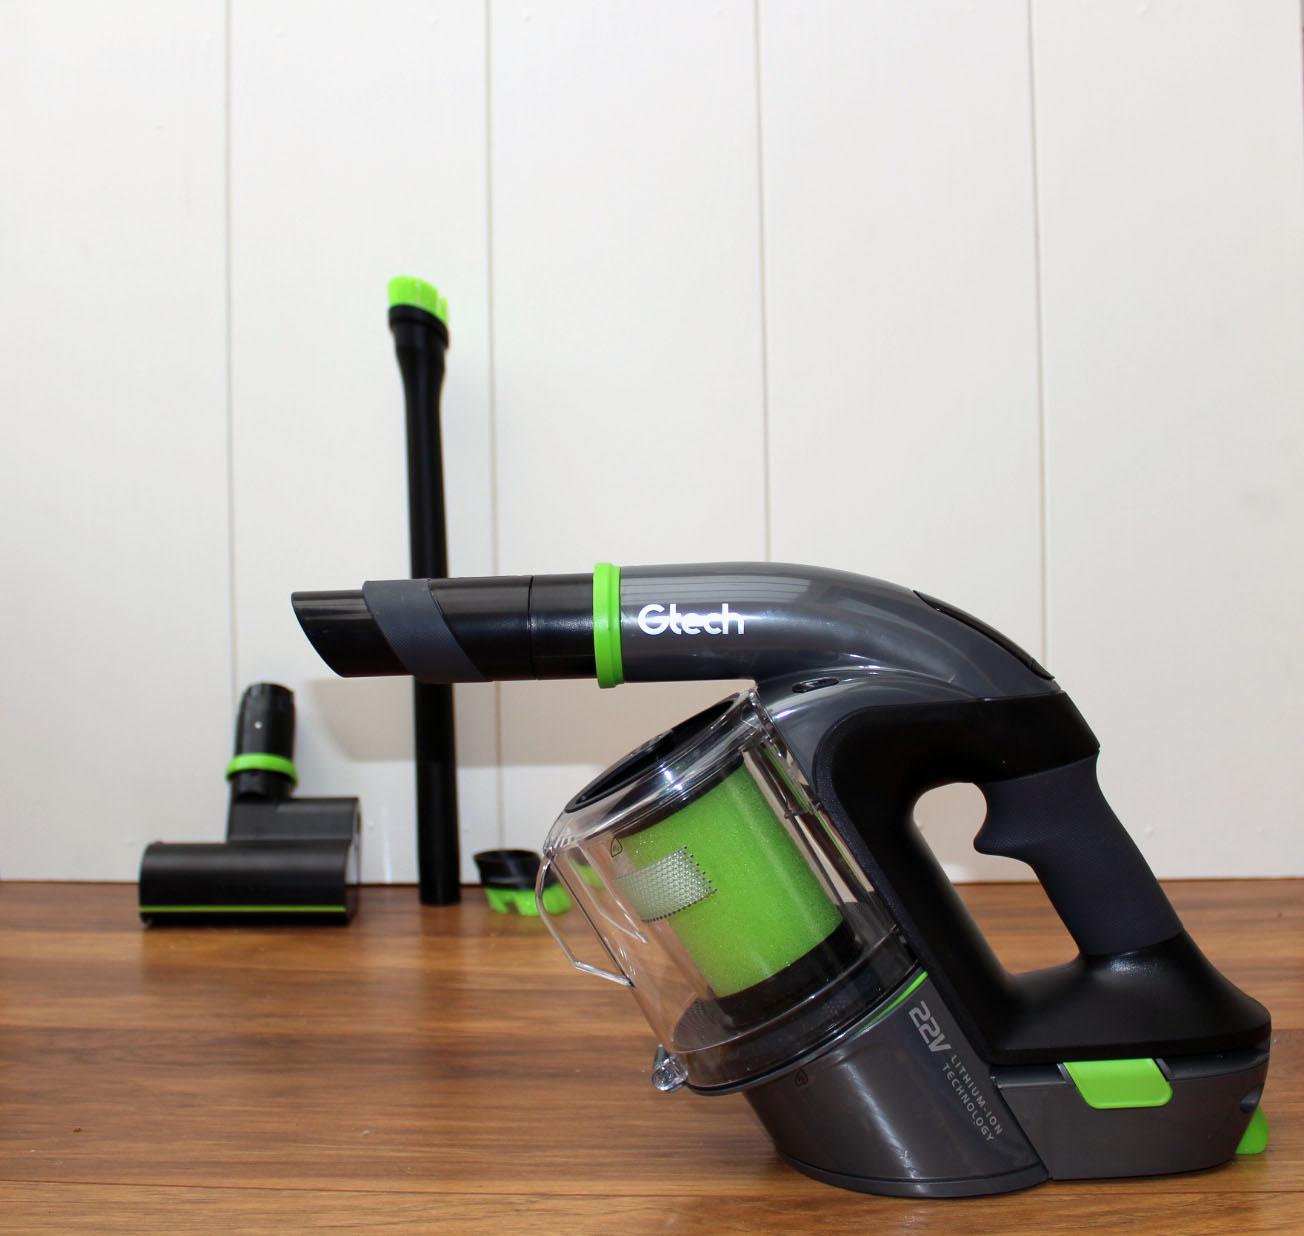 Gtech Multi, vacuum cleaner, cordless vacuum cleaner, handheld vacuum cleaner, giveaway, dadbloguk, dadbloguk.com